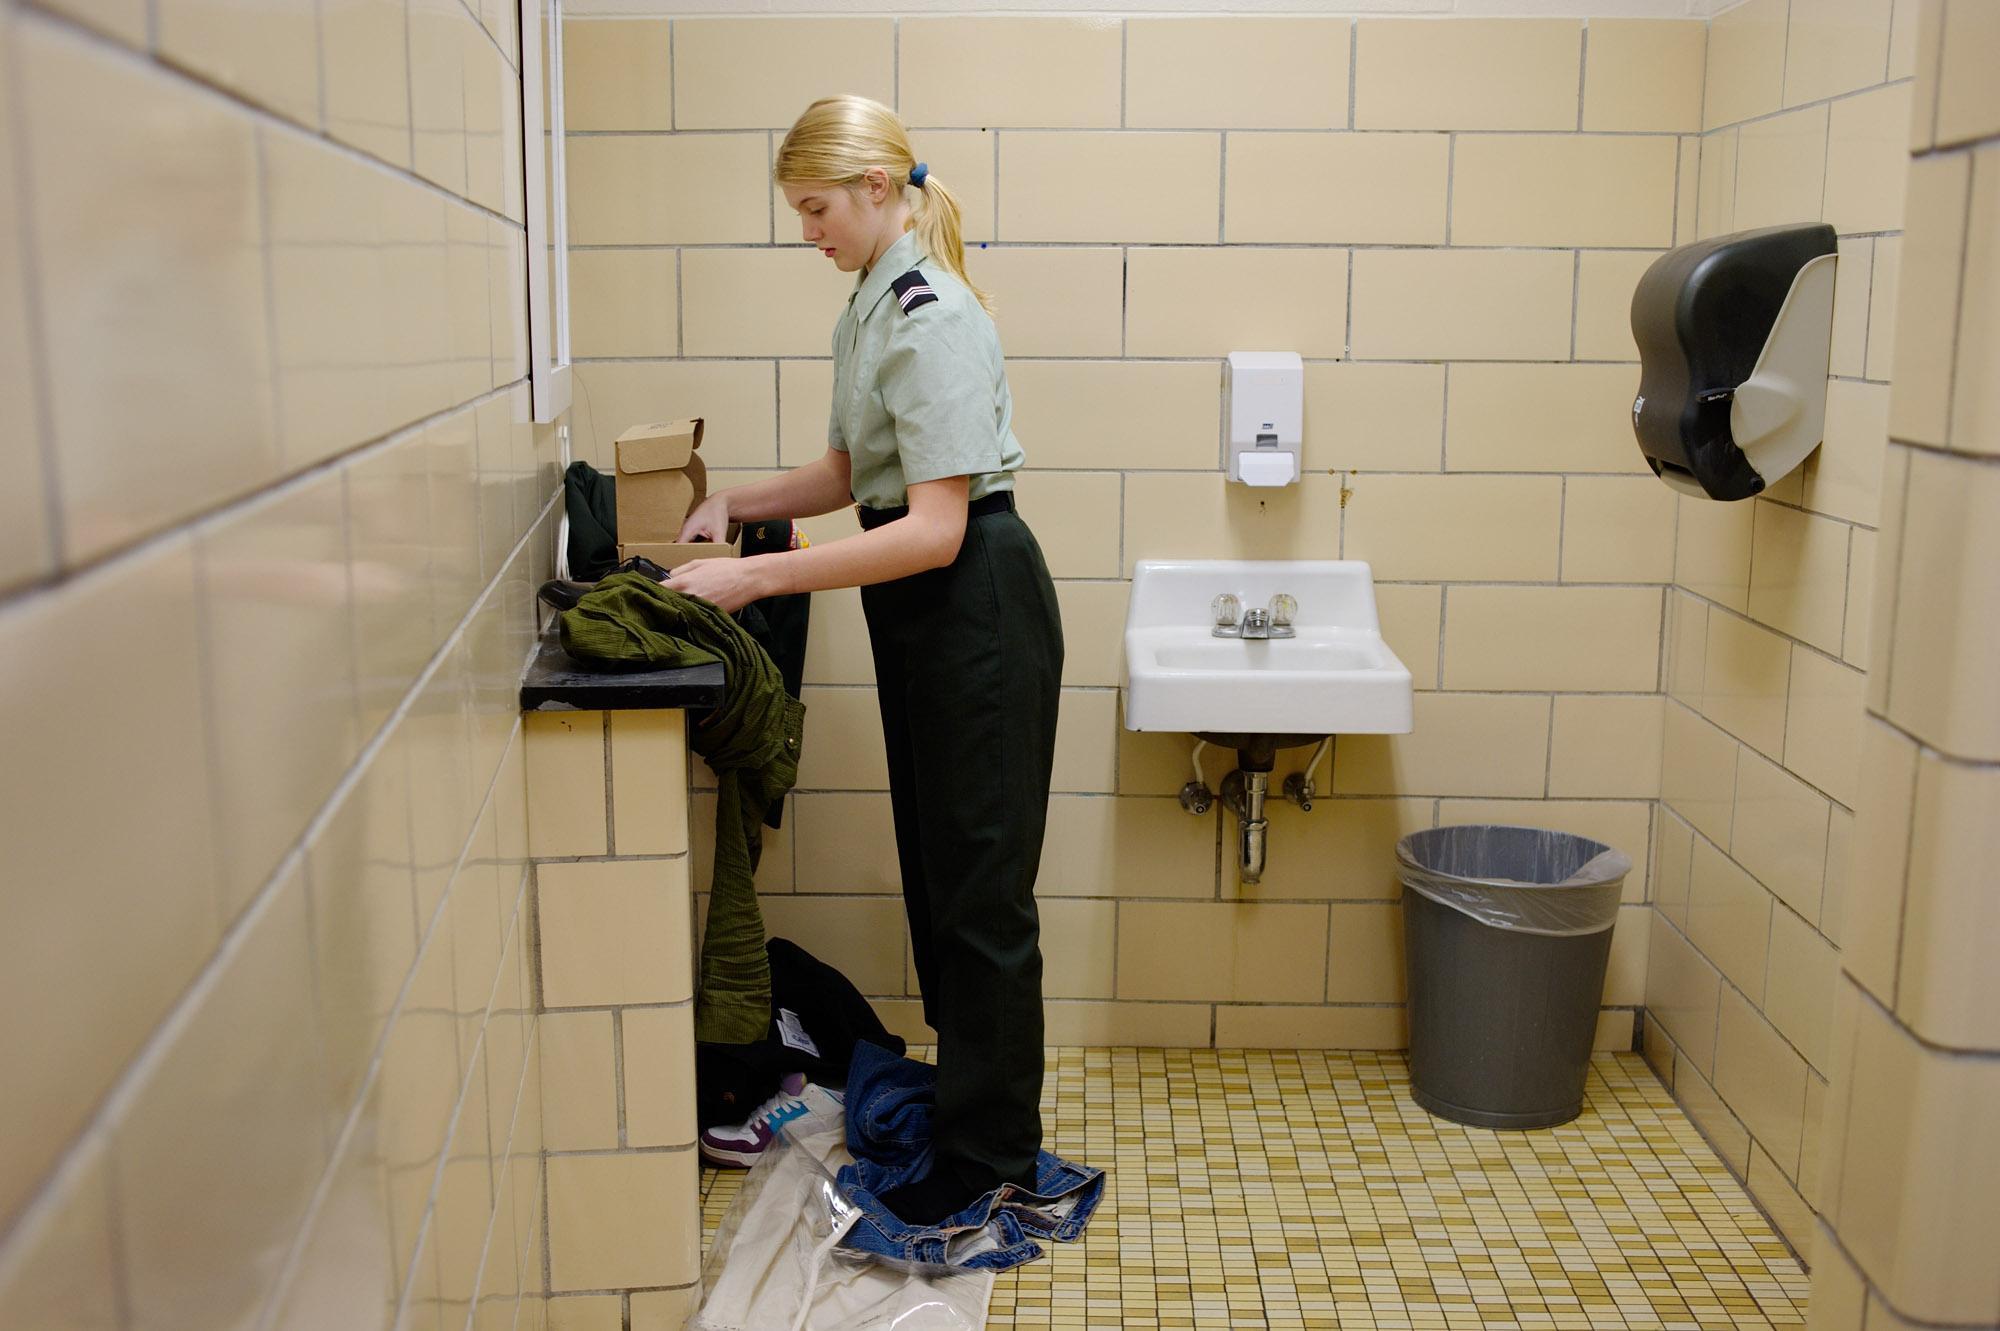 Jasmine changing into her Class B uniform in the school's bathroom. Langdon, New Hampshire, USA. December 2010.